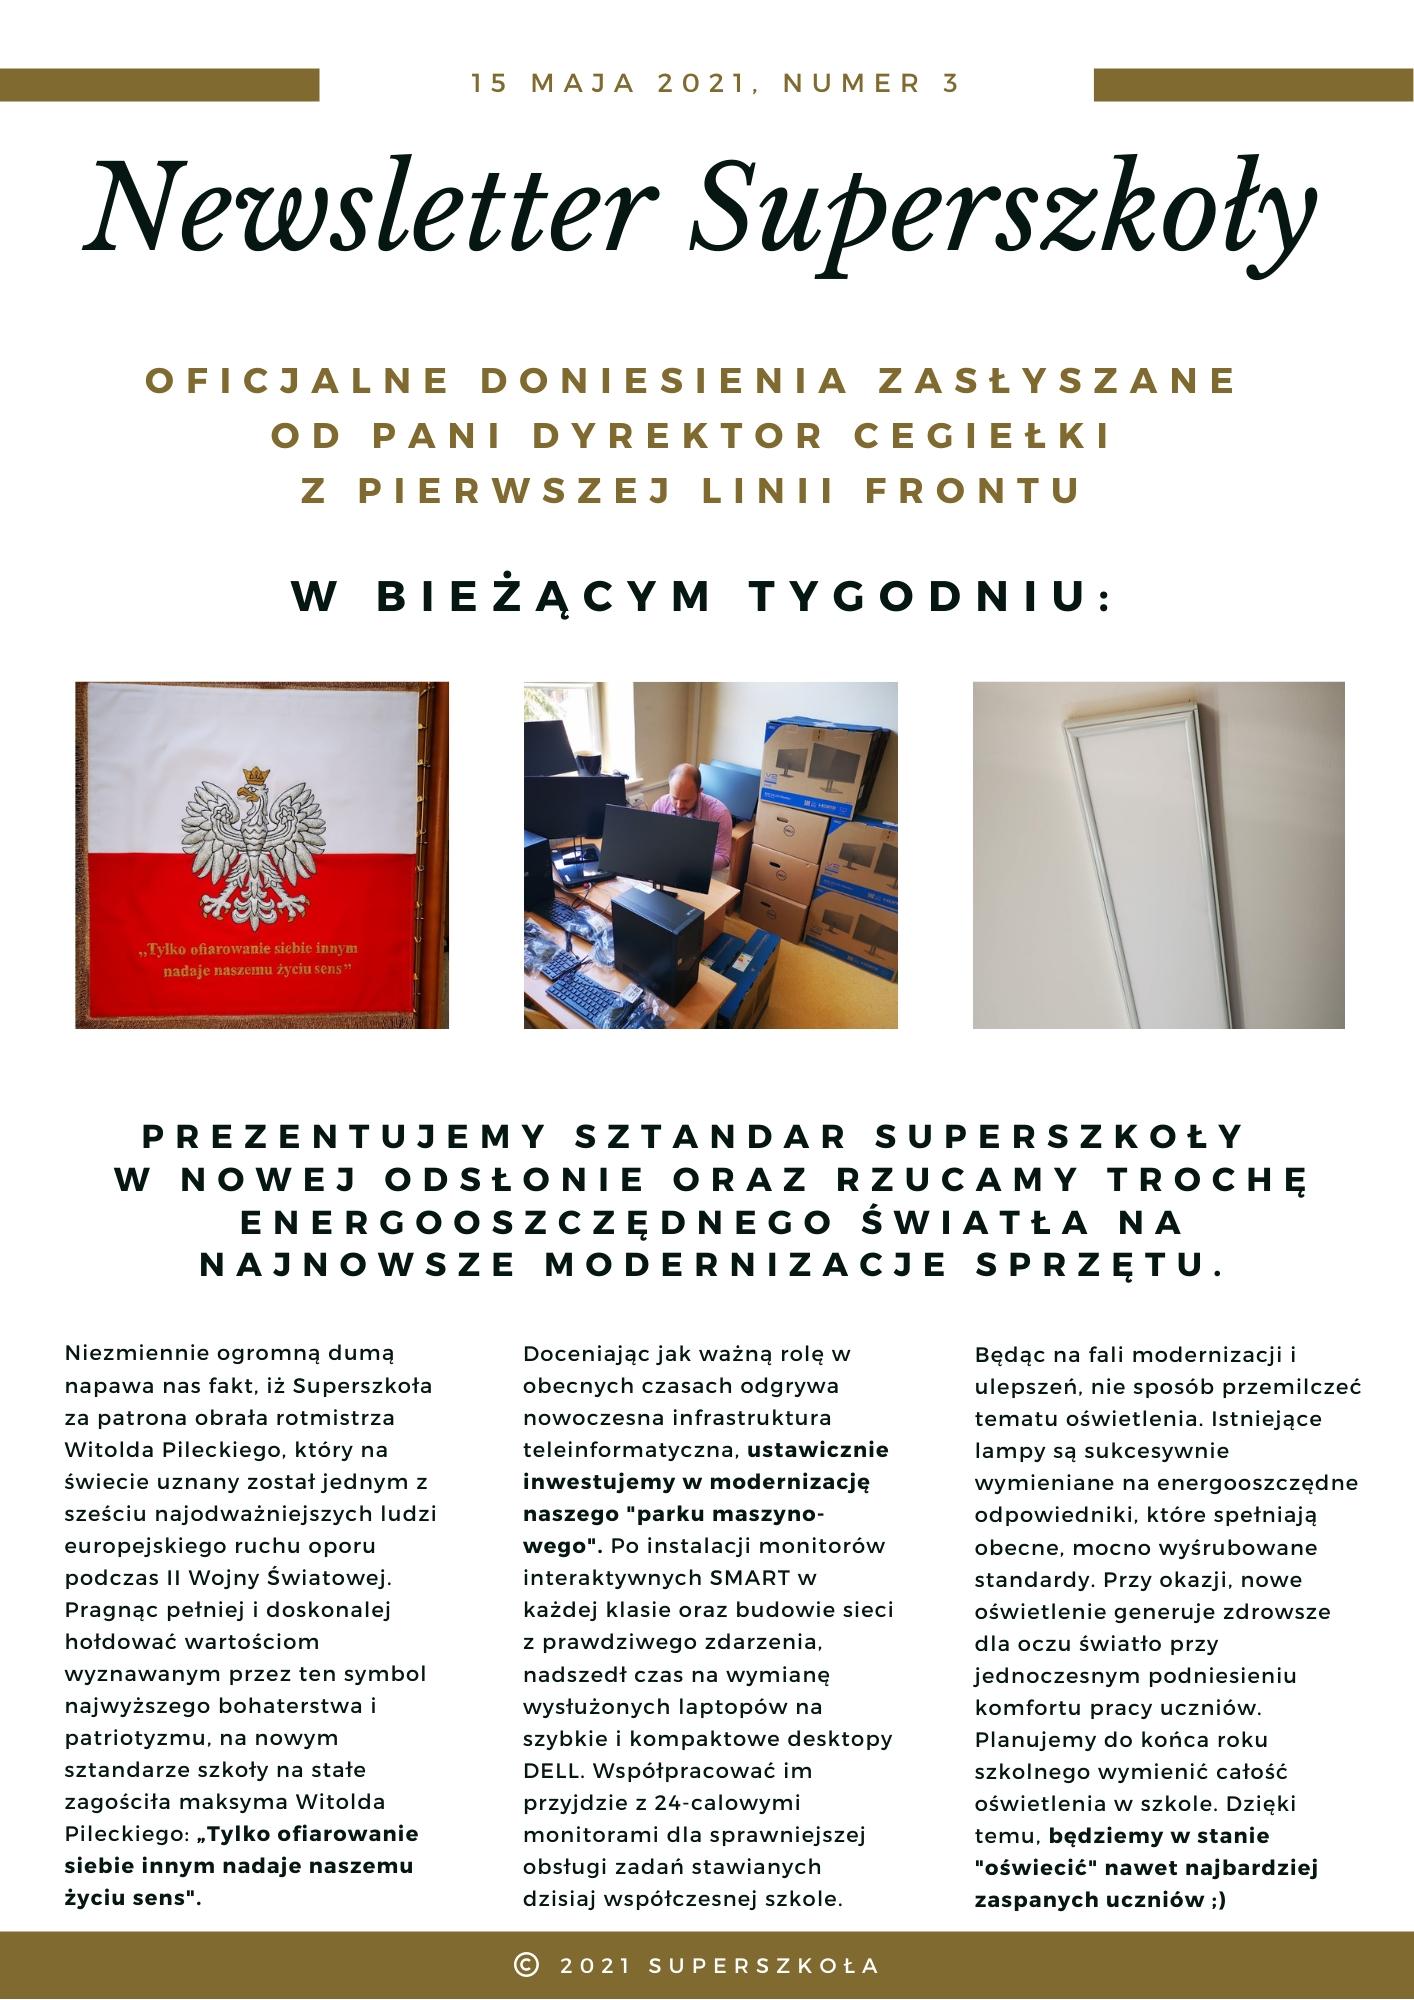 Newsletter_Superszkoły_3